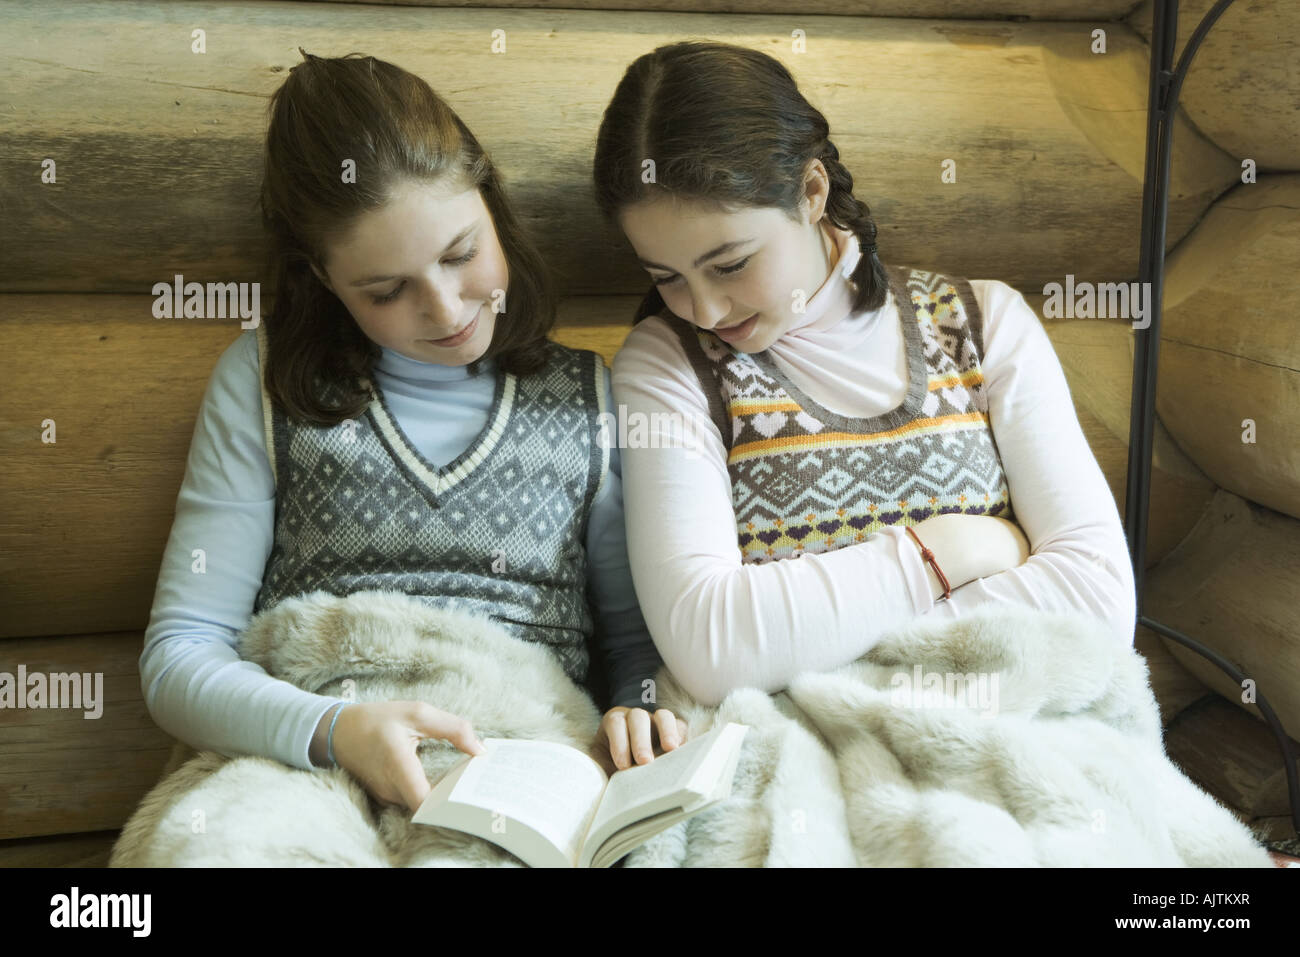 caldo adolescente ragazze